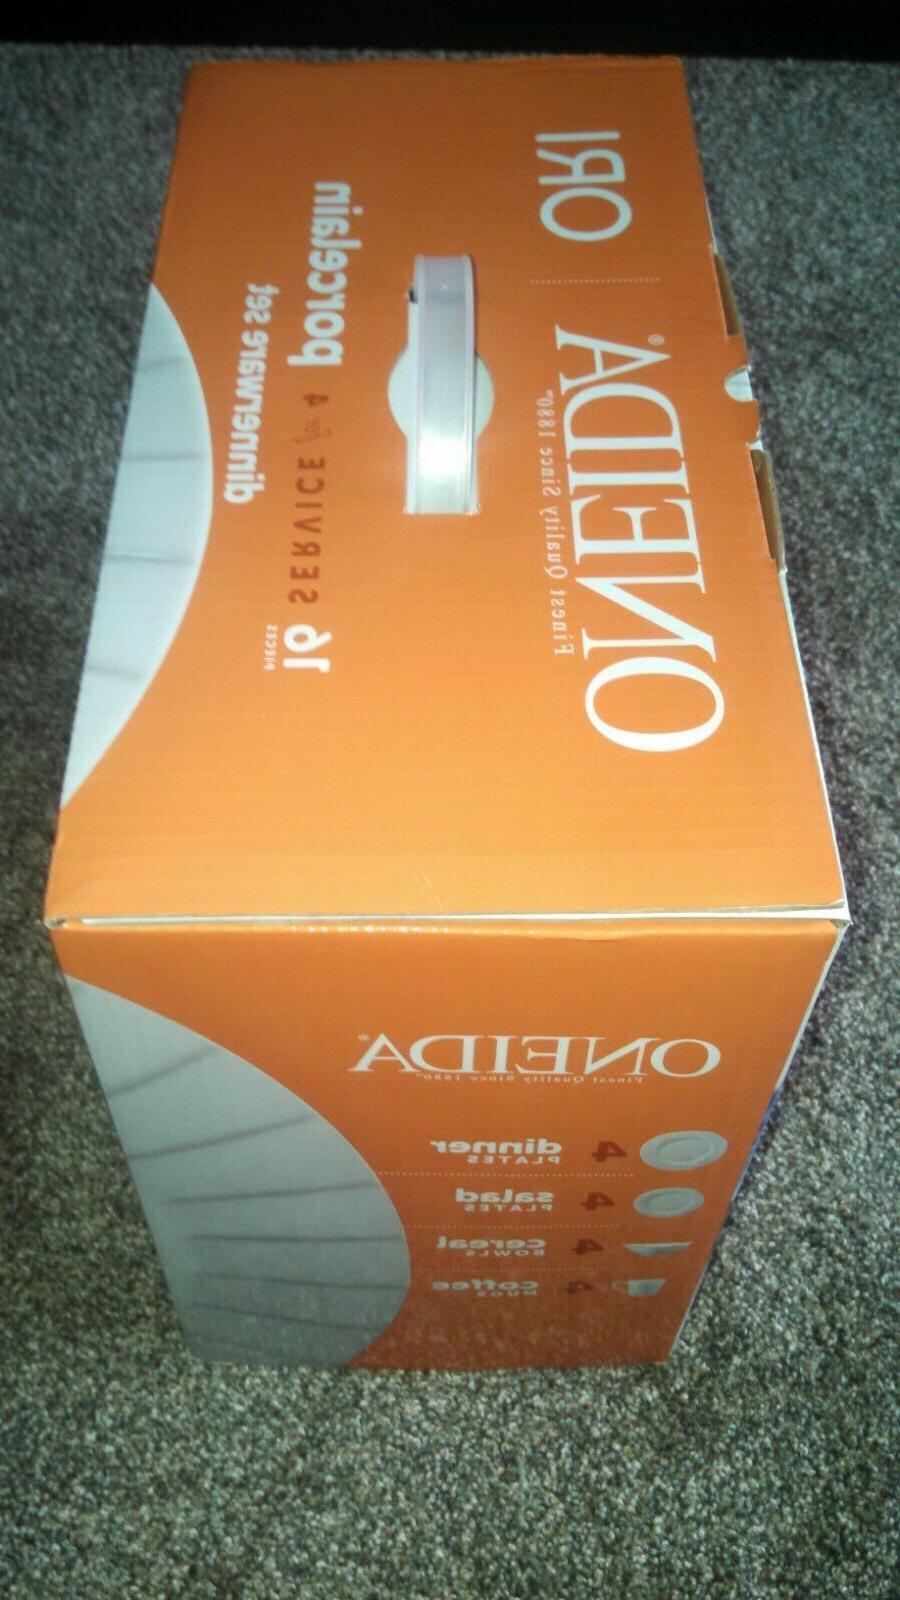 Oneida ORI Porcelain for 4